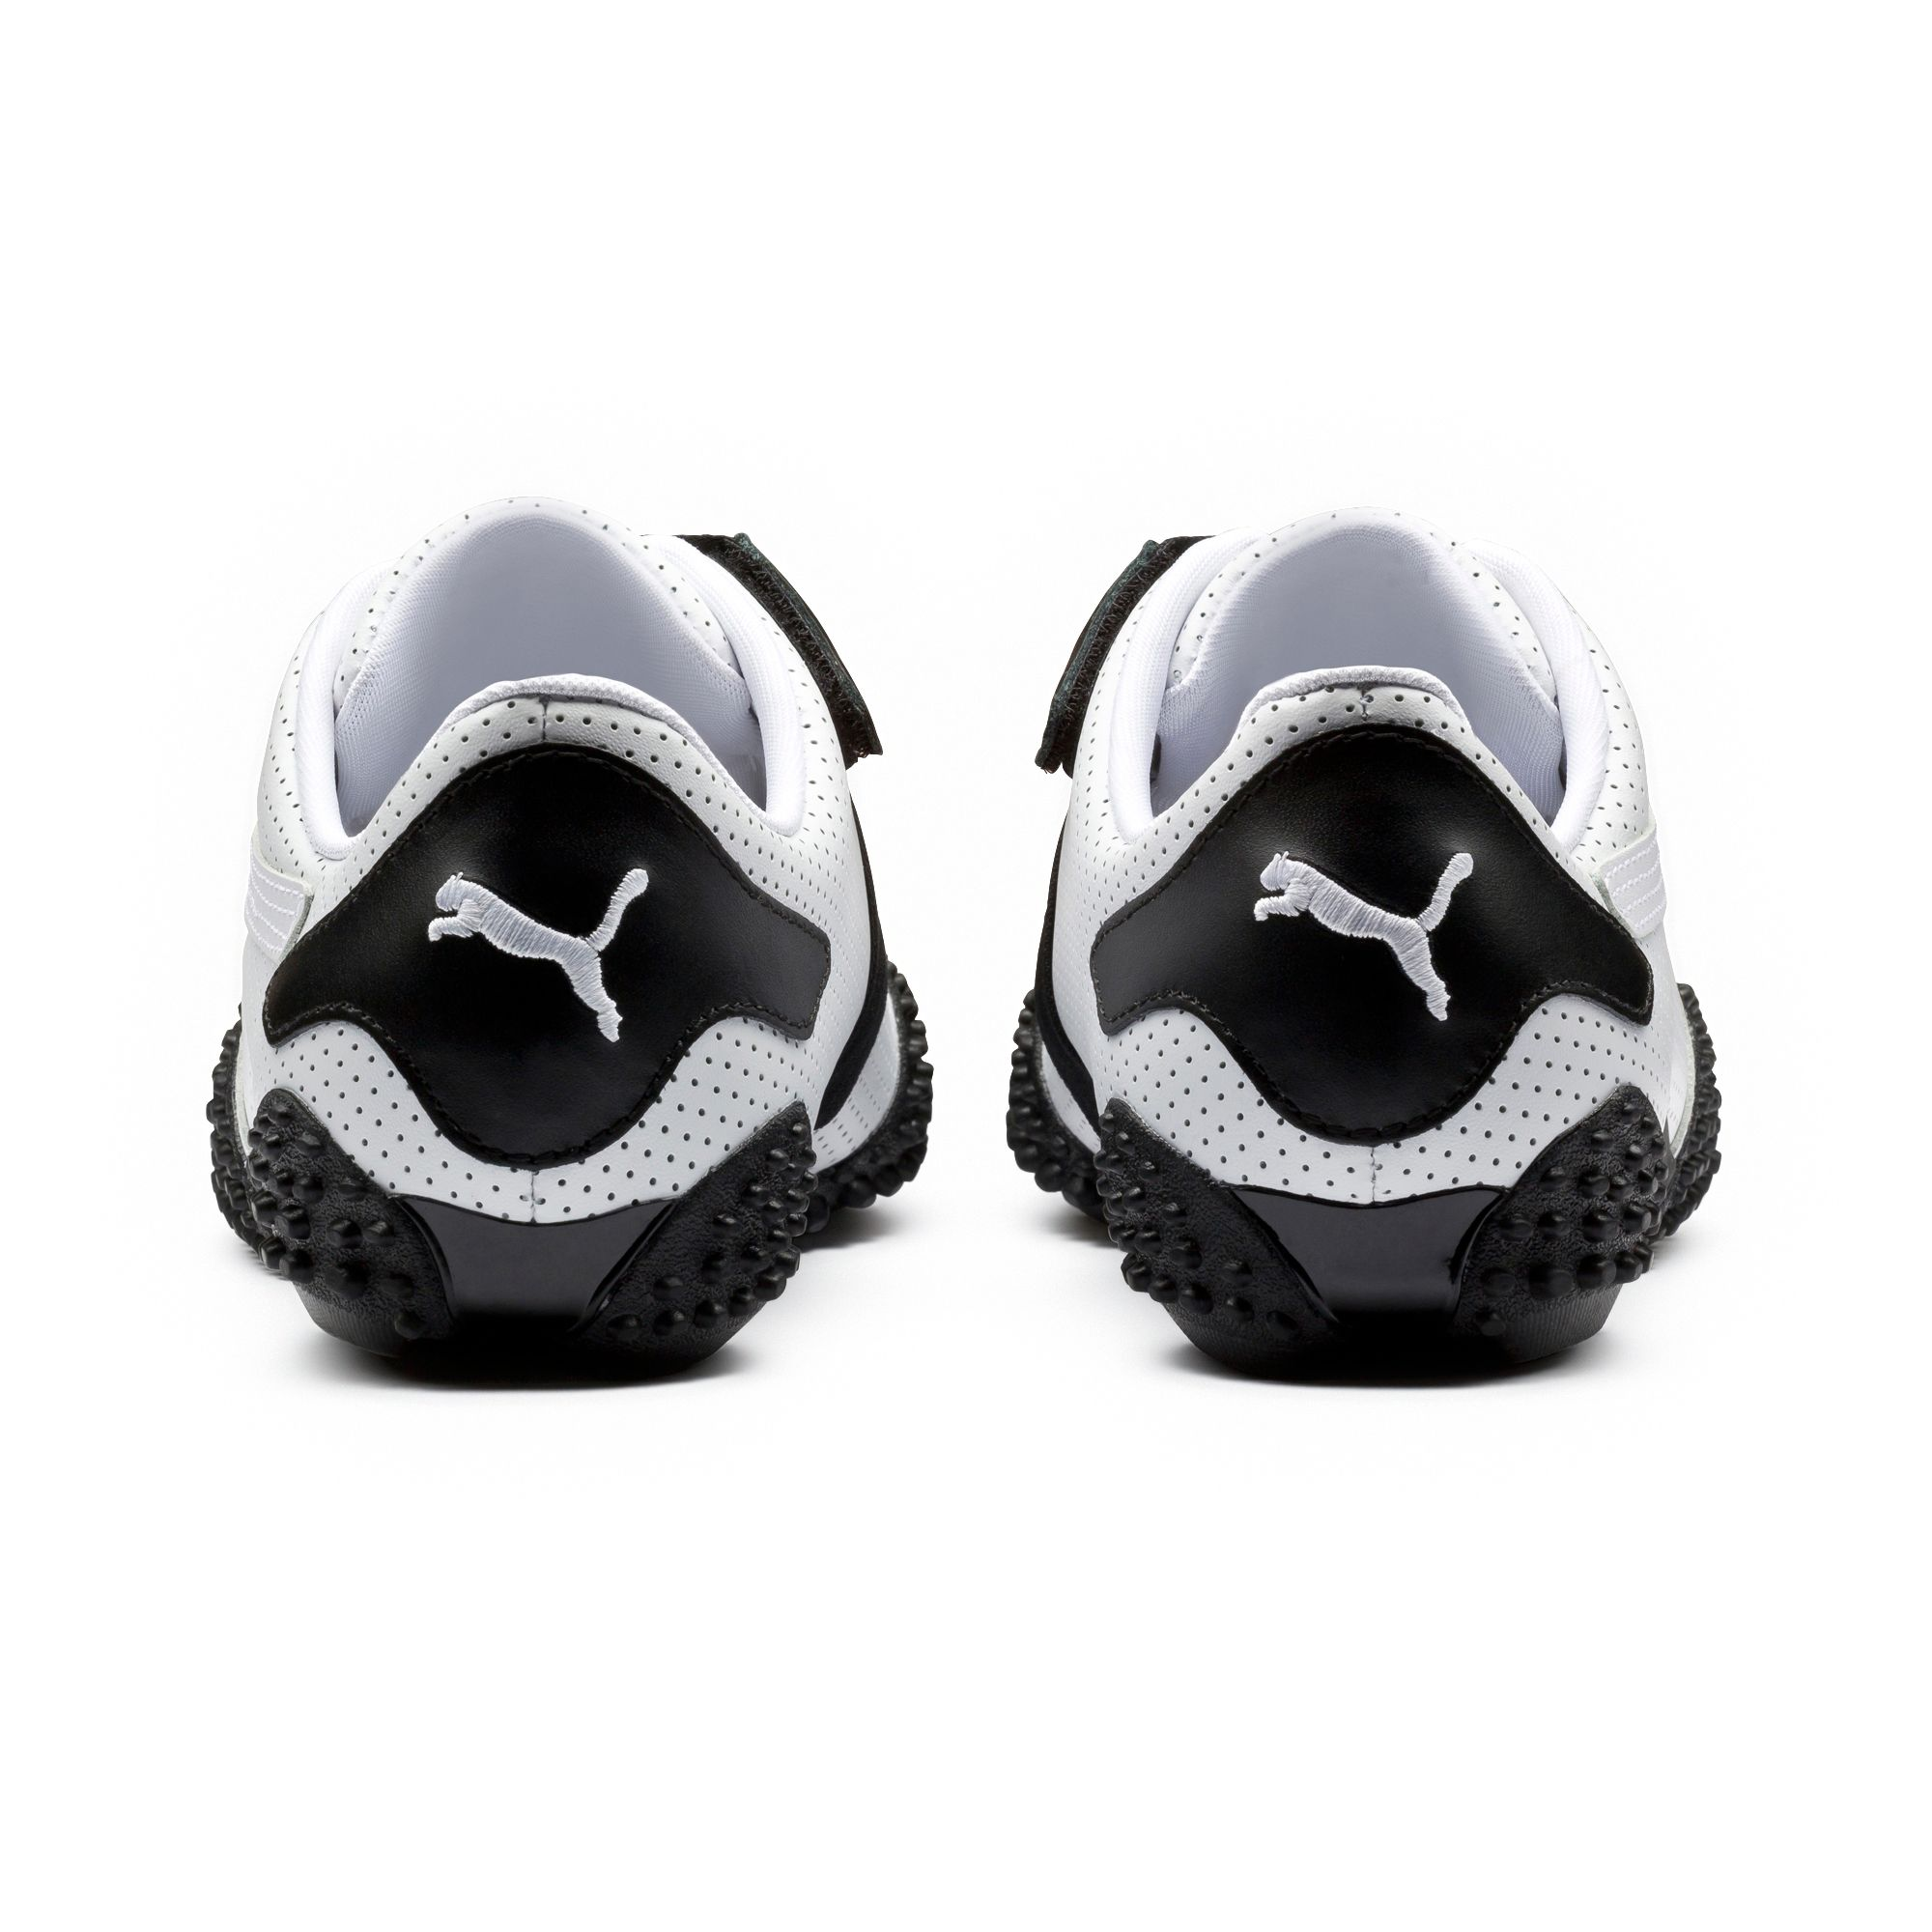 21698f85ae1c PUMA - Puma Men s Mostro Perforated White   Black Ankle-High Running Shoe -  11.5M - Walmart.com